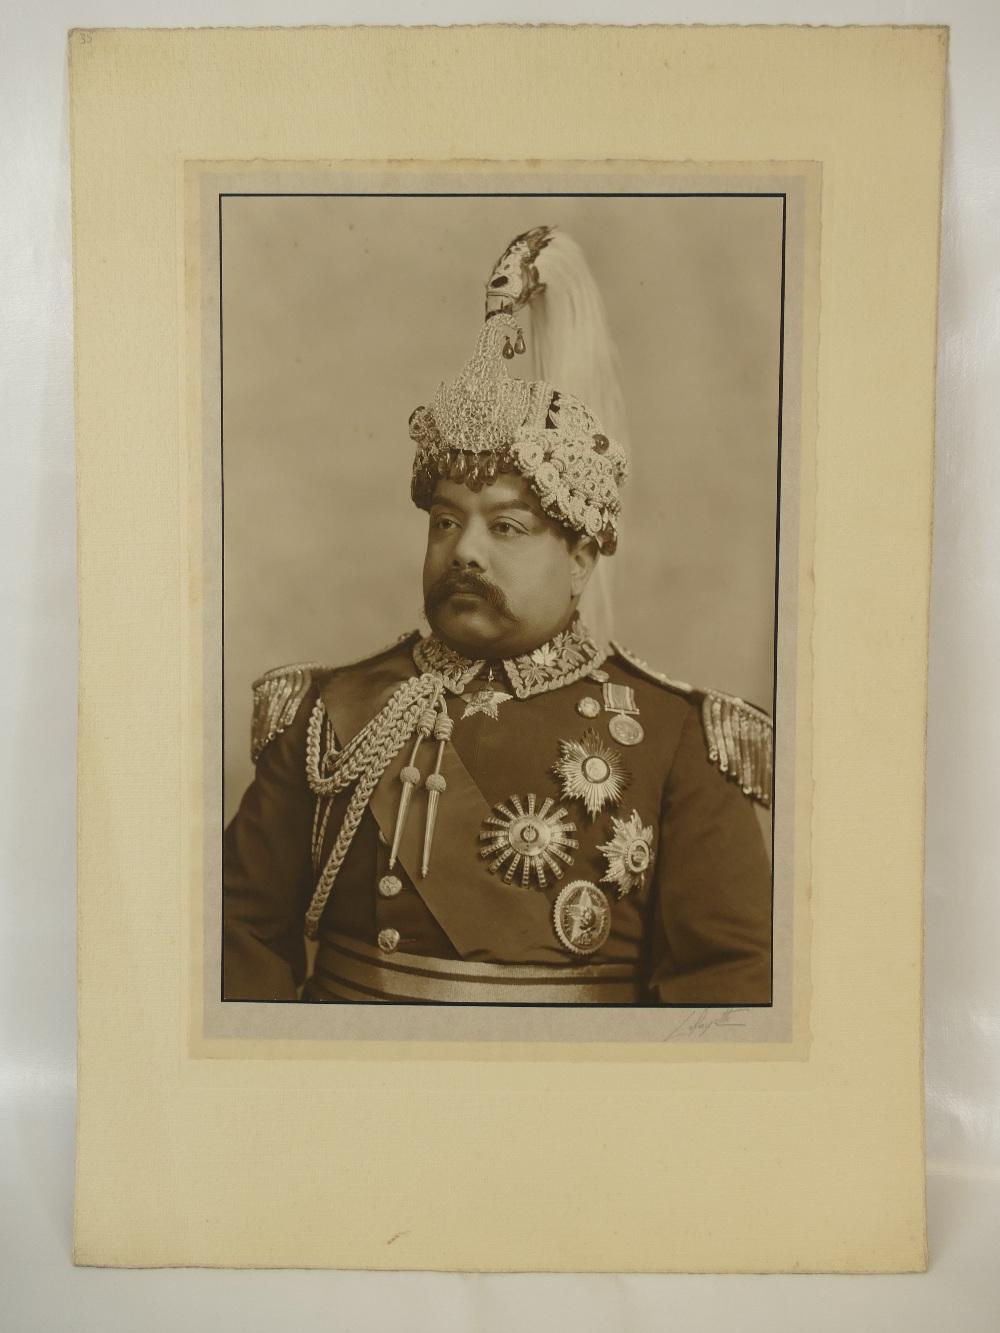 Lot 6 - Nepal - His ex. Sir Bahadur Shumshere Rana Jung C.B.E.